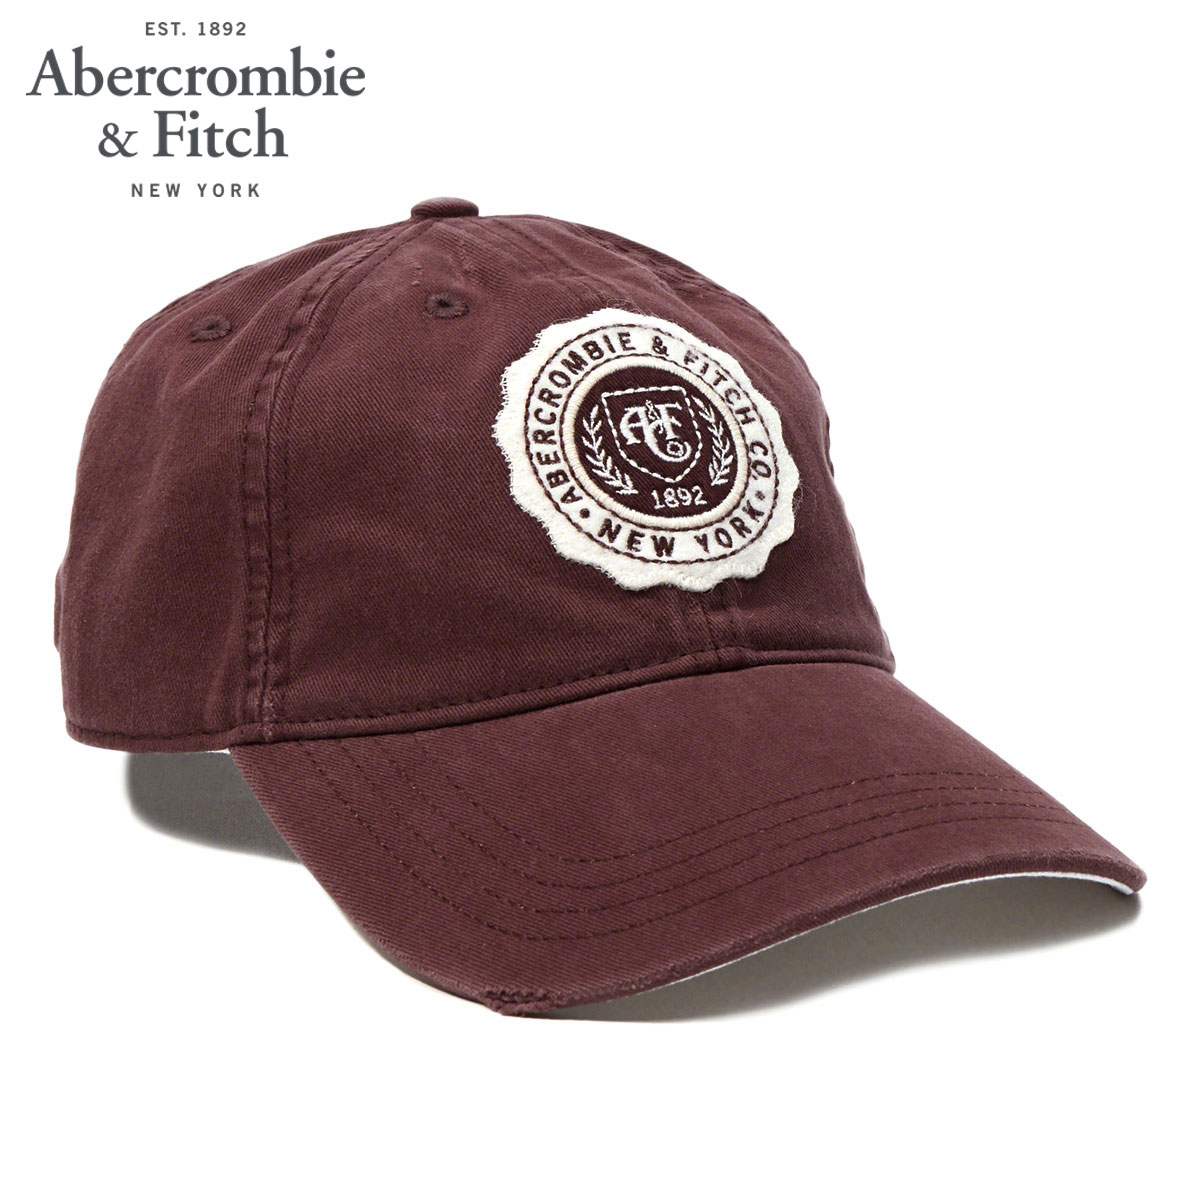 42600ba14d92d ABBA black Abercrombie   Fitch regular article men cap TWILL CREST CAP  112-178-0211-500